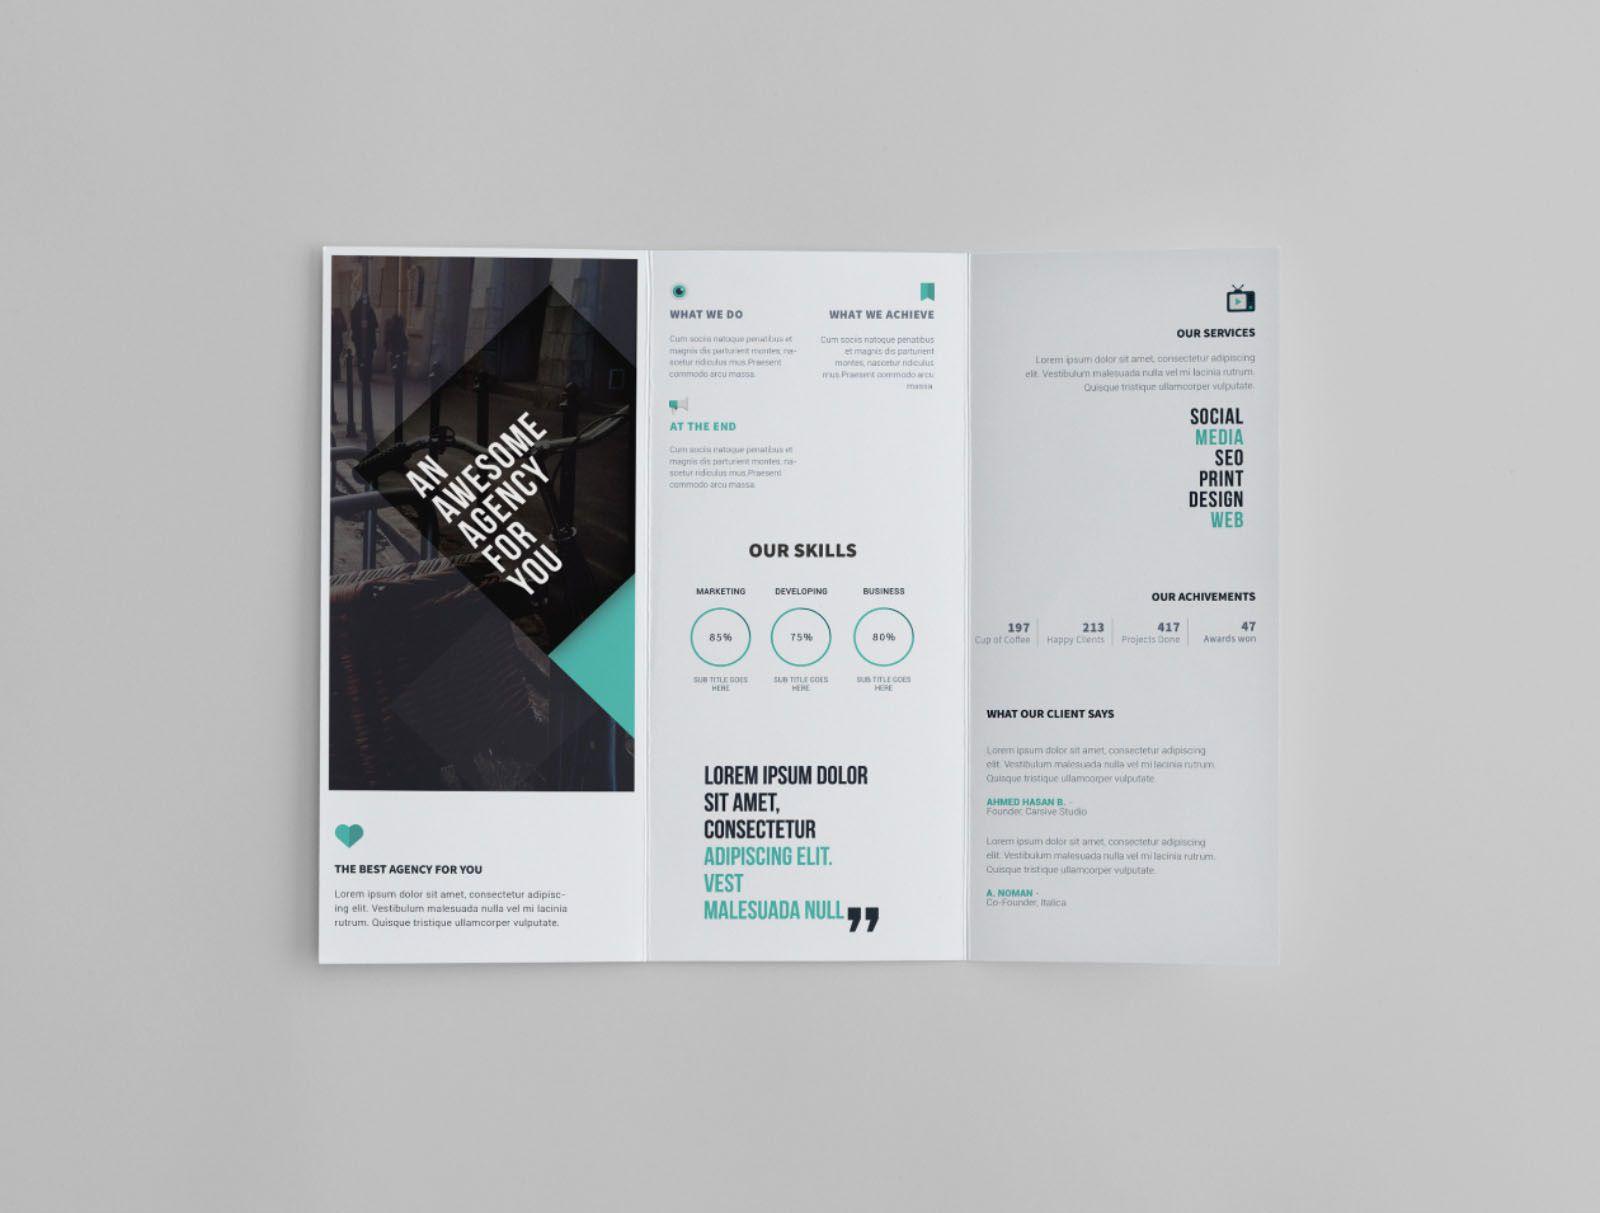 009 Exceptional Free Tri Fold Brochure Template Inspiration  Photoshop Illustrator Microsoft Word 2010Full